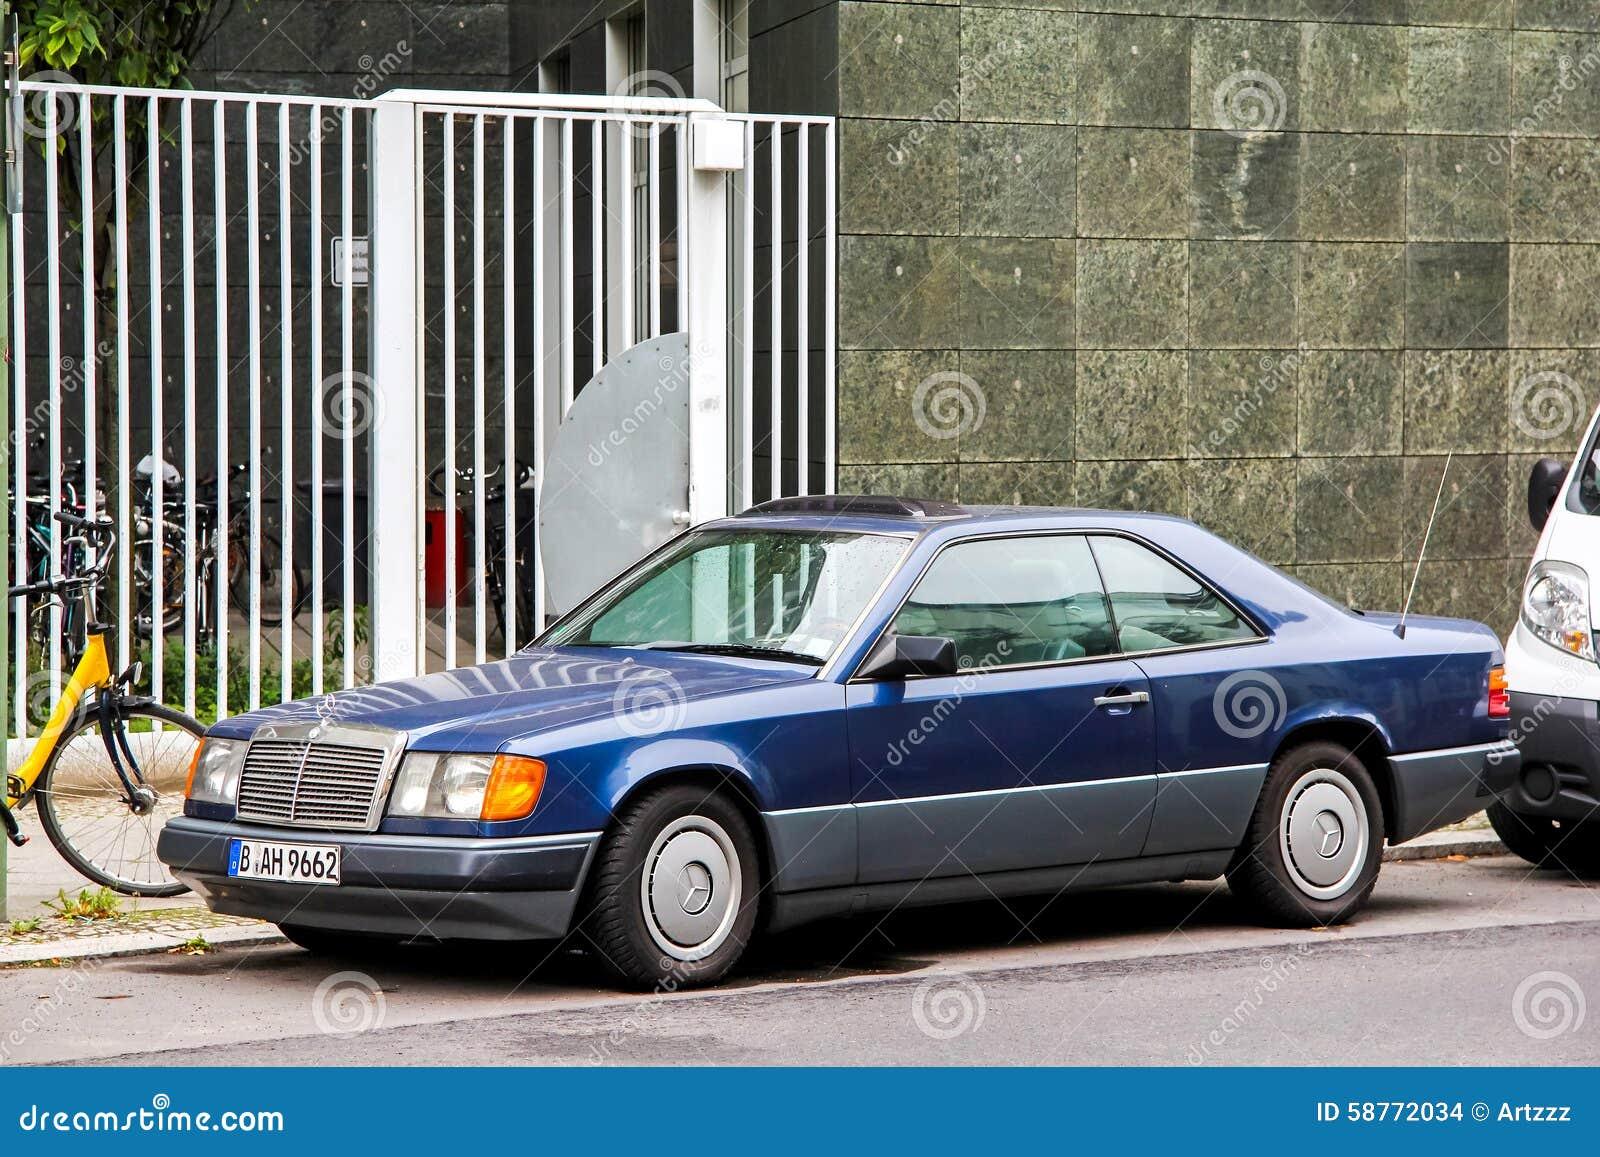 Blue mercedes benz a class car editorial photo for Mercedes benz e350 tire size